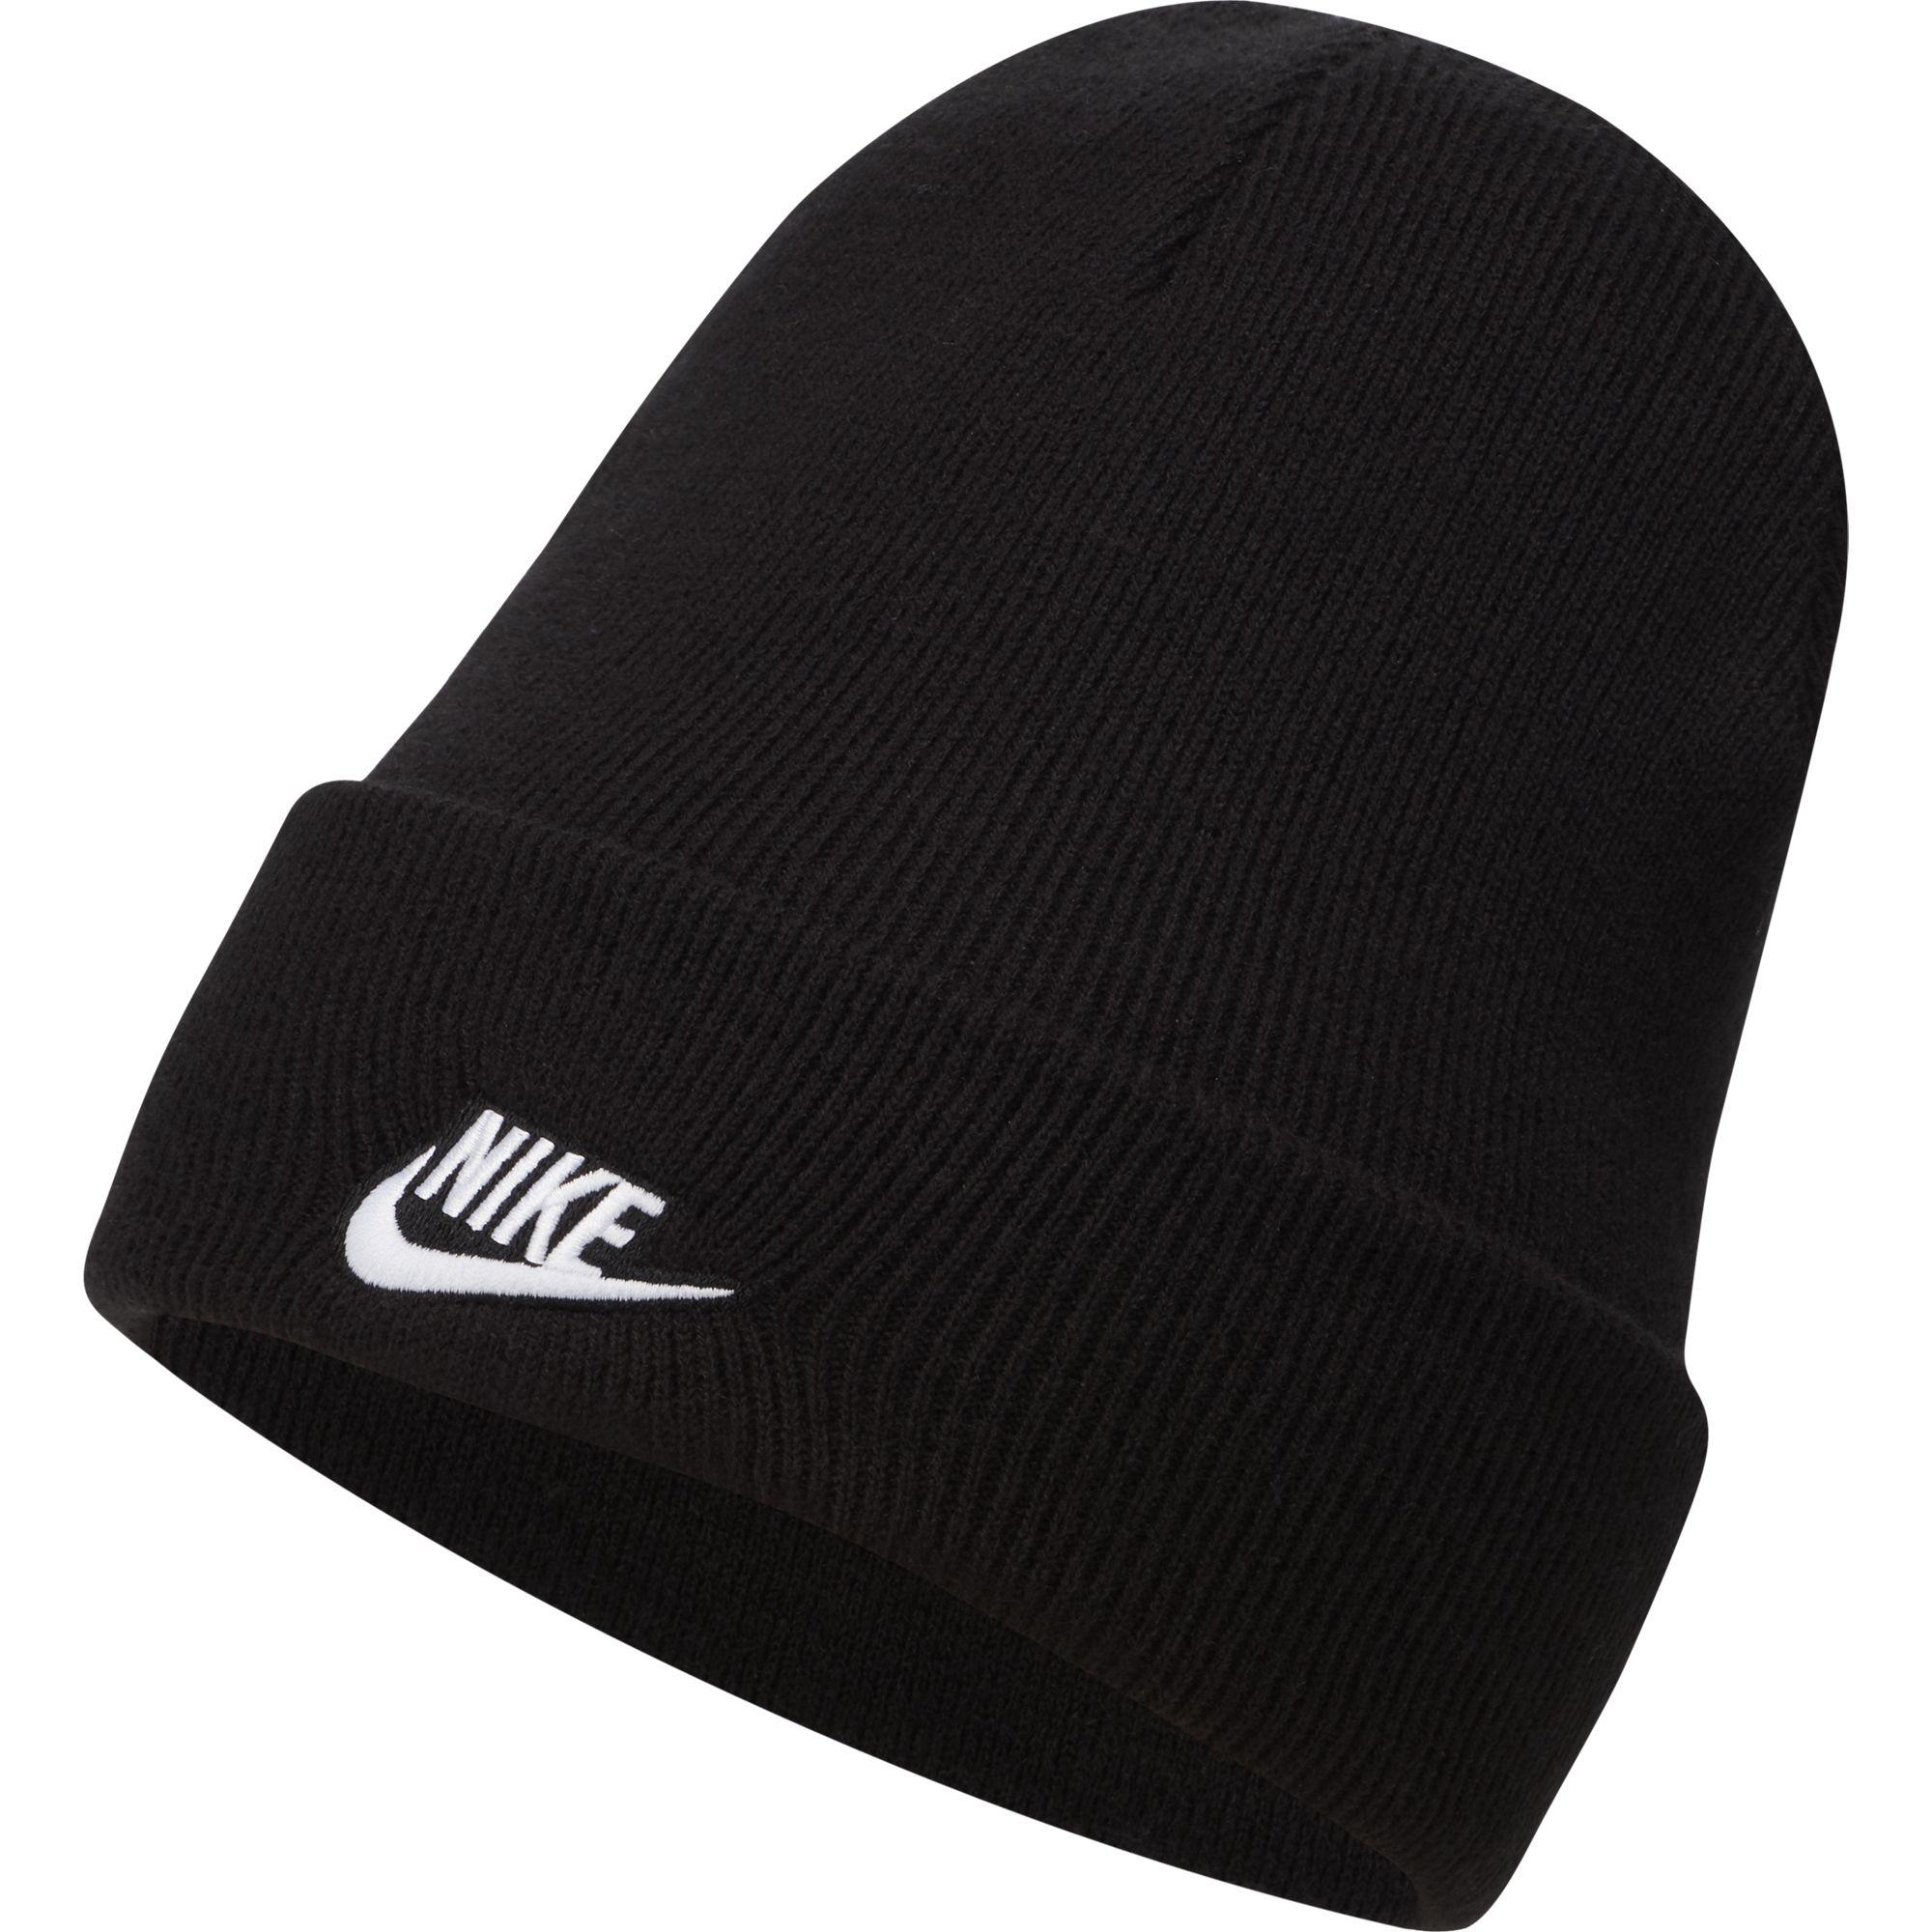 Men's Cuffed Beanie Utility Ski Hat, Black, swatch